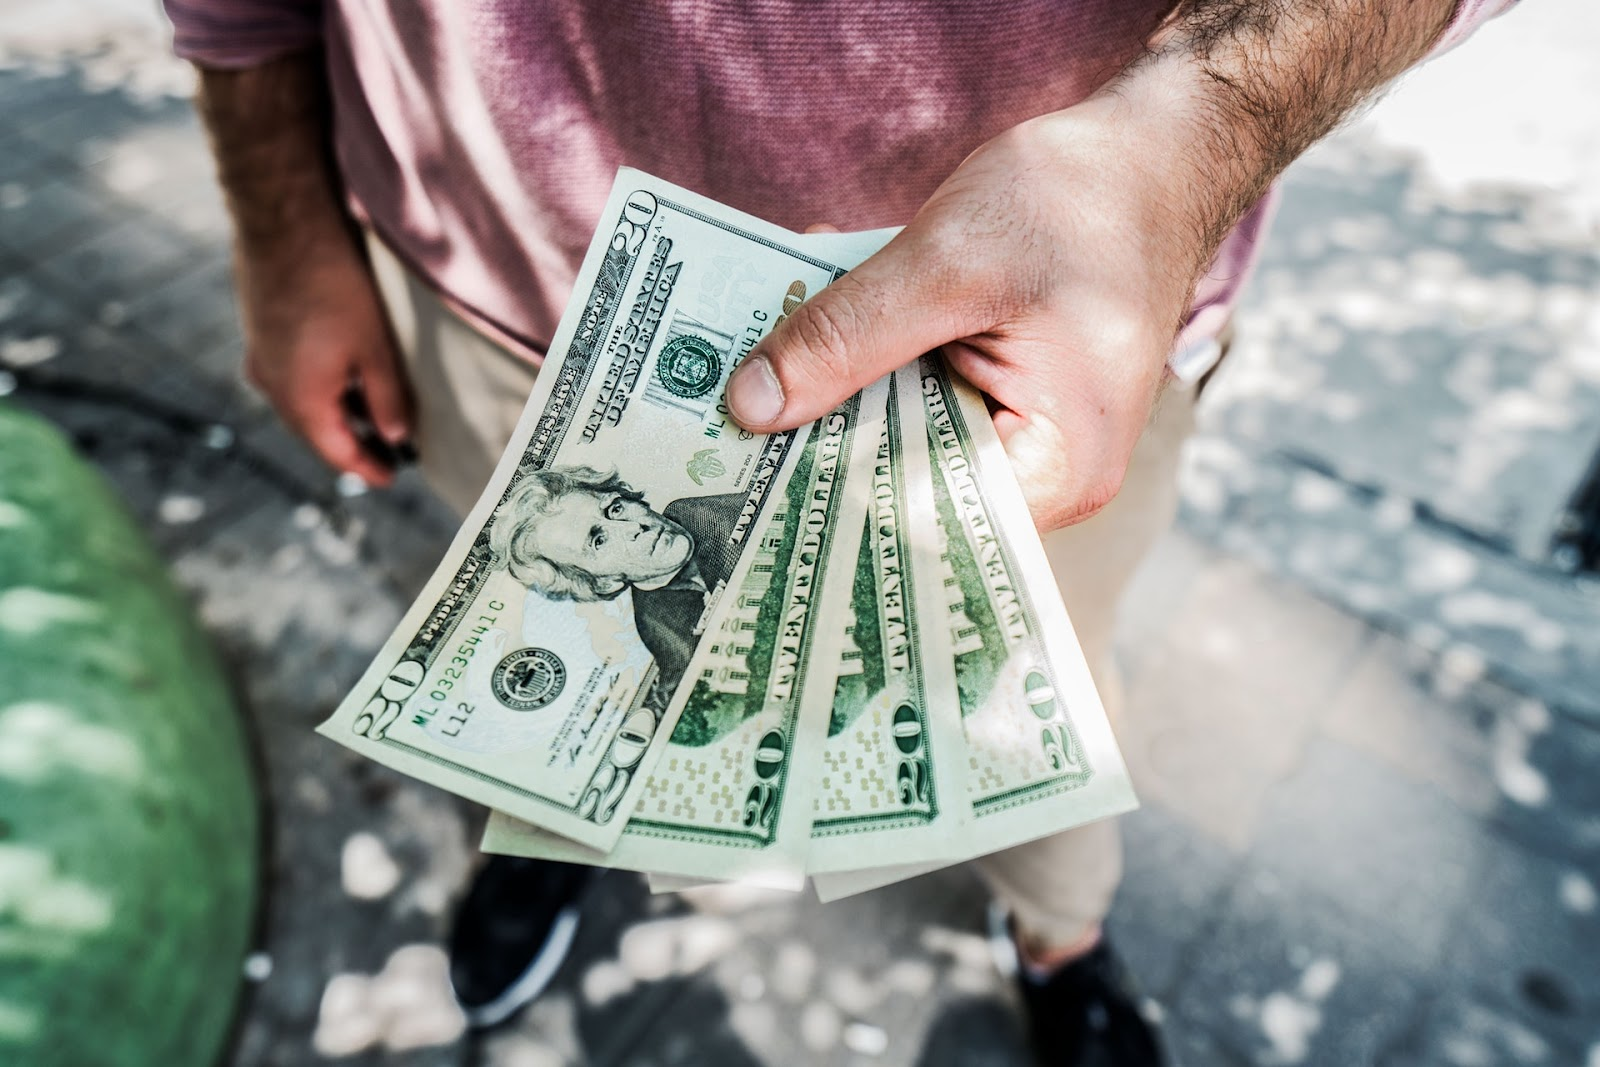 man handing over 20 dollar bills